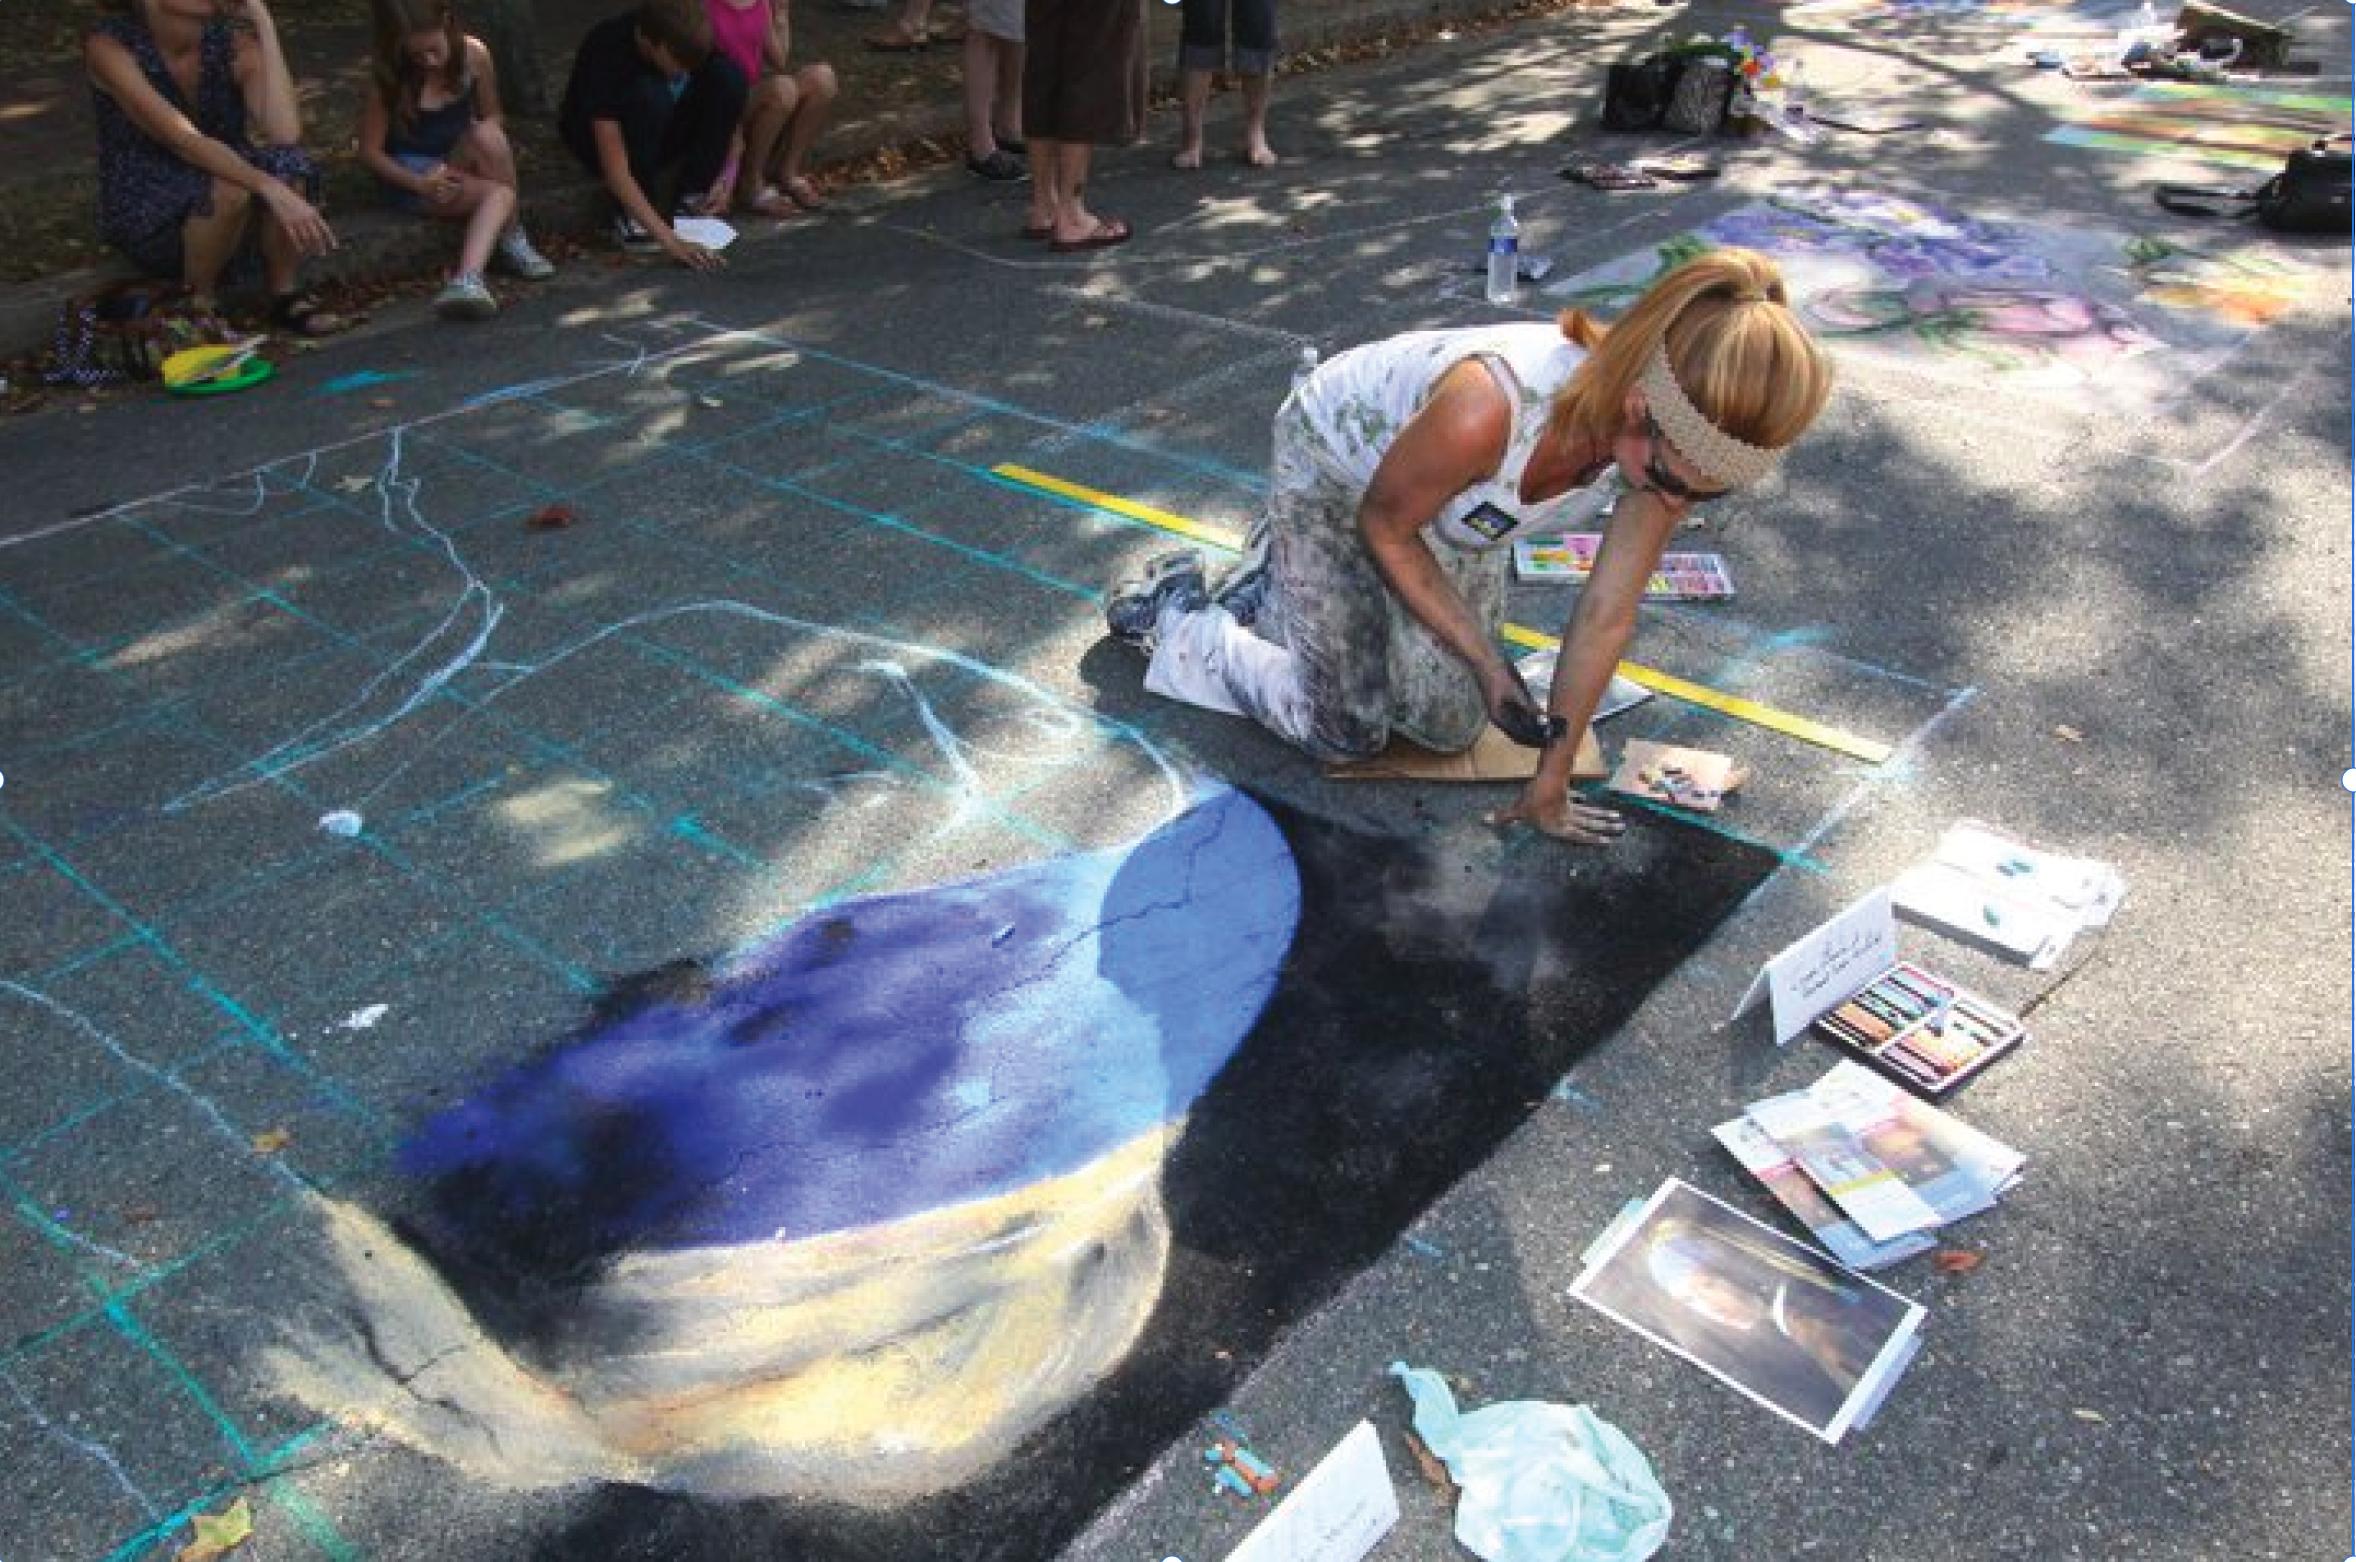 An artist recreates a painting on the street